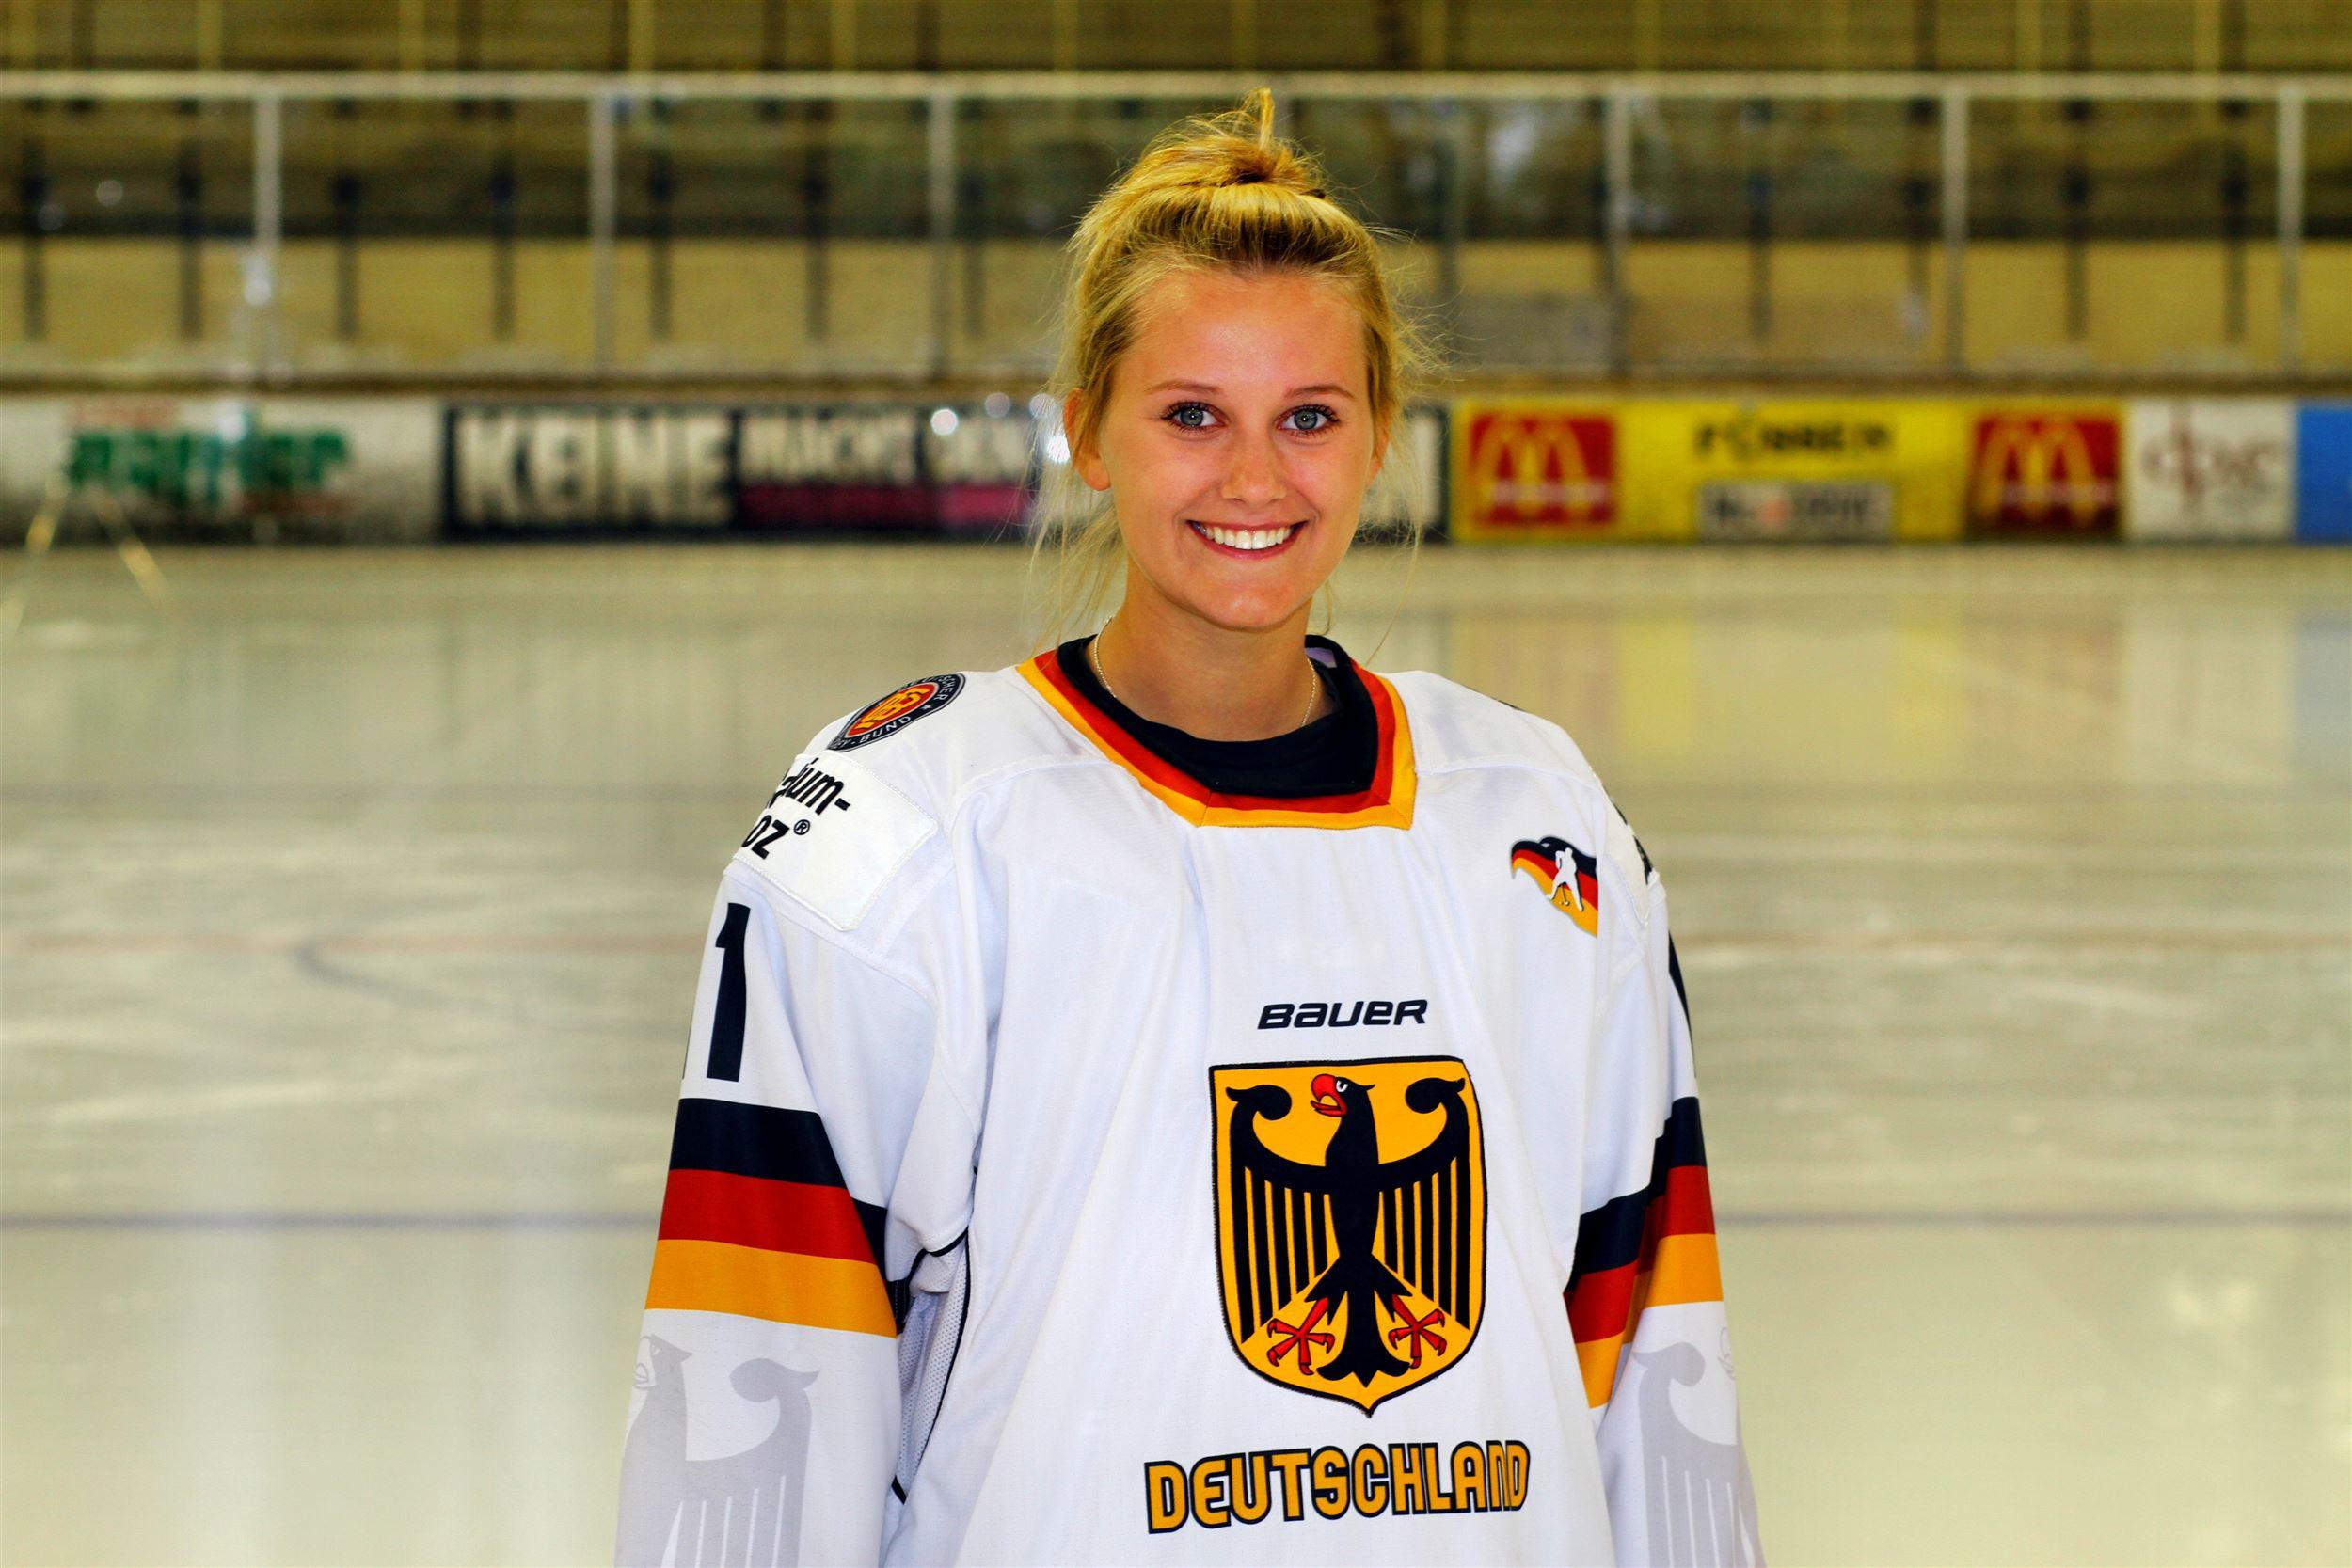 Eisenschmid, Nicola